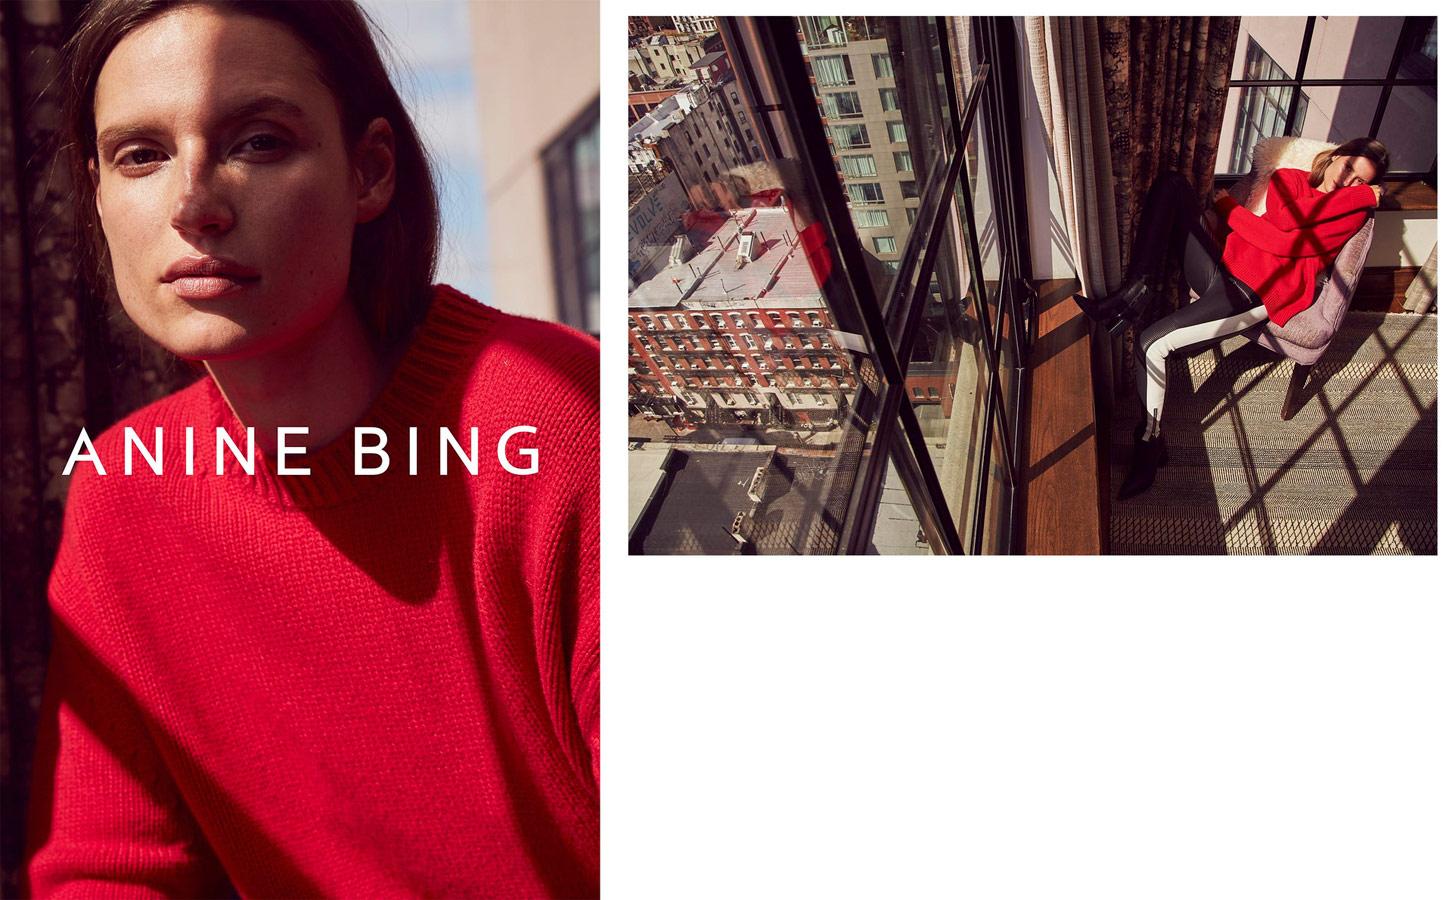 Рекламная кампания Anine Bing, © Бенджо Арвас, Лос-Анджелес, США, Финалист категории «Реклама», «Взгляд» — фотоконкурс на тему «Мода» | PDN The Look